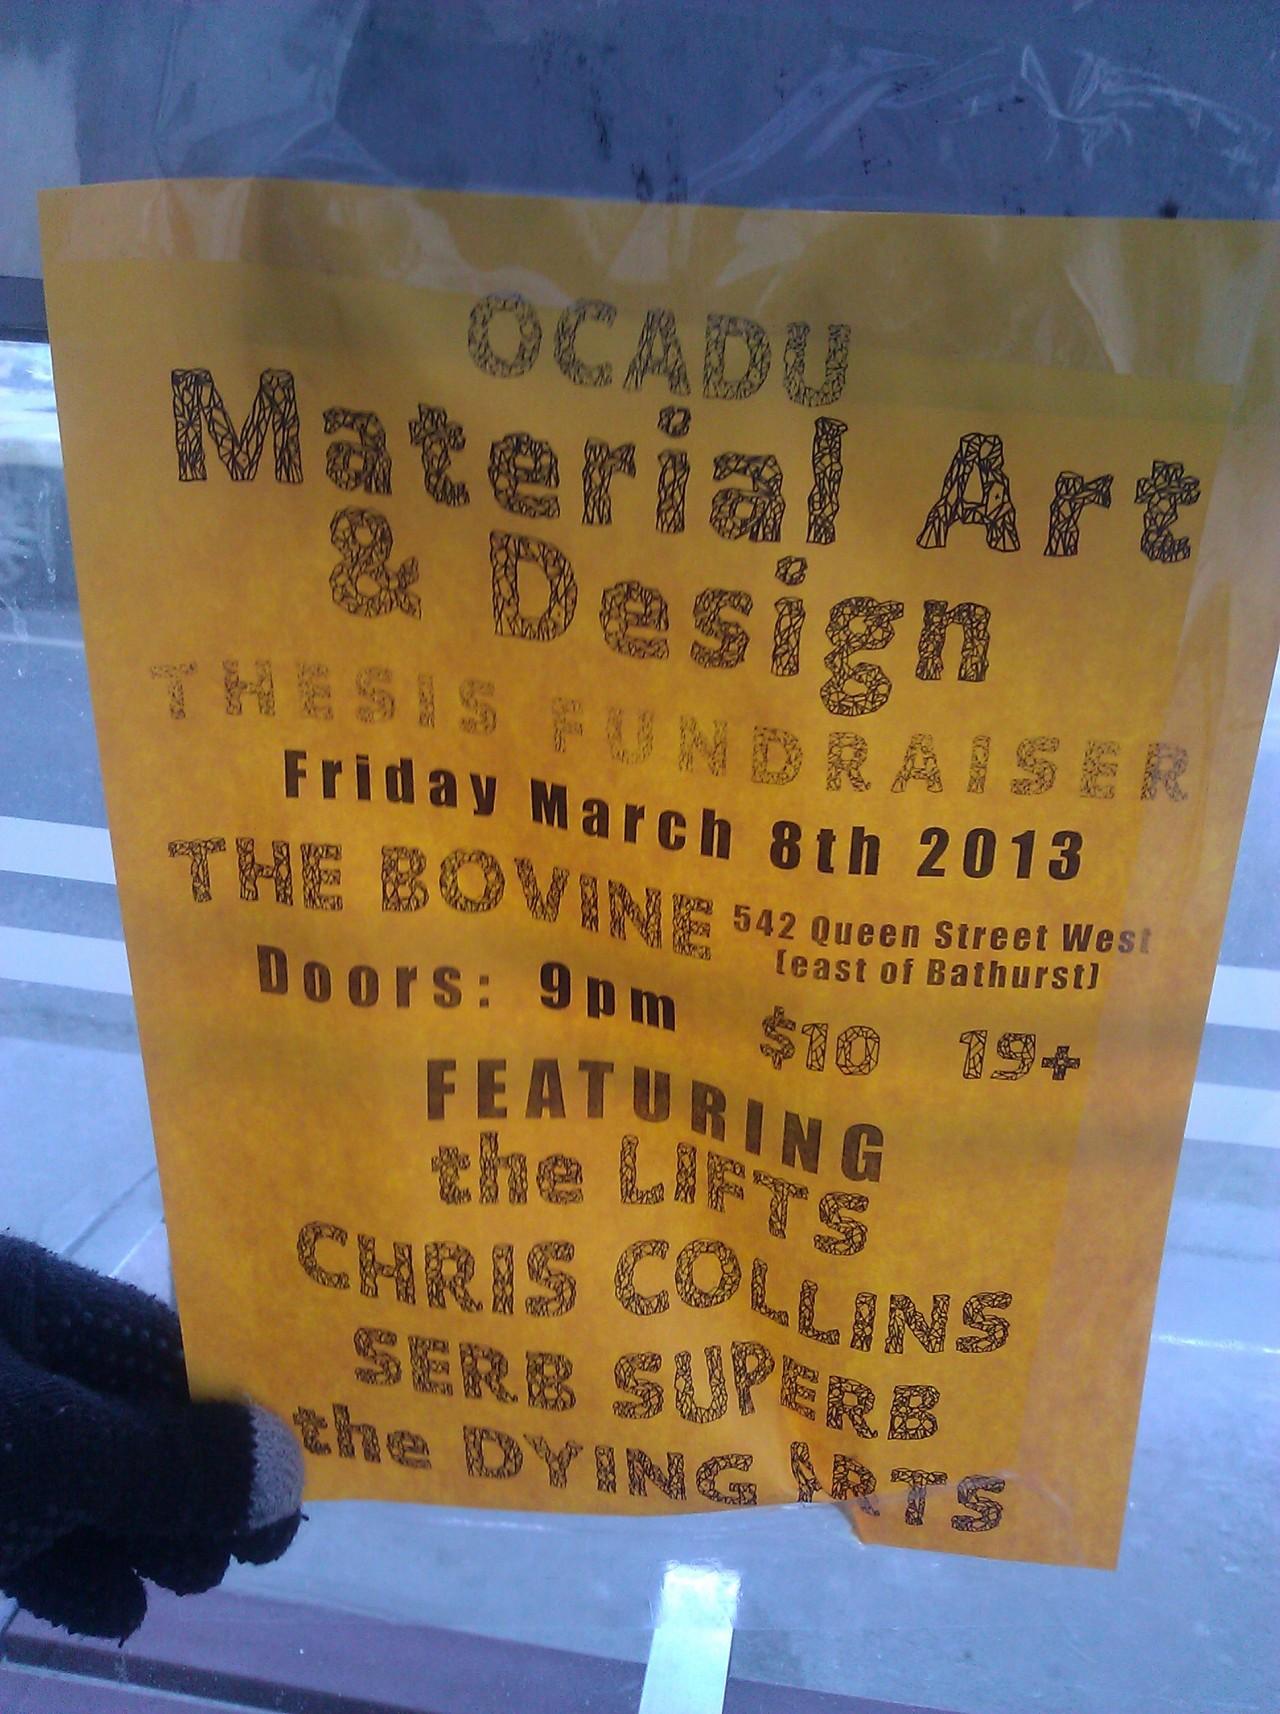 OCADU Material Art & Design